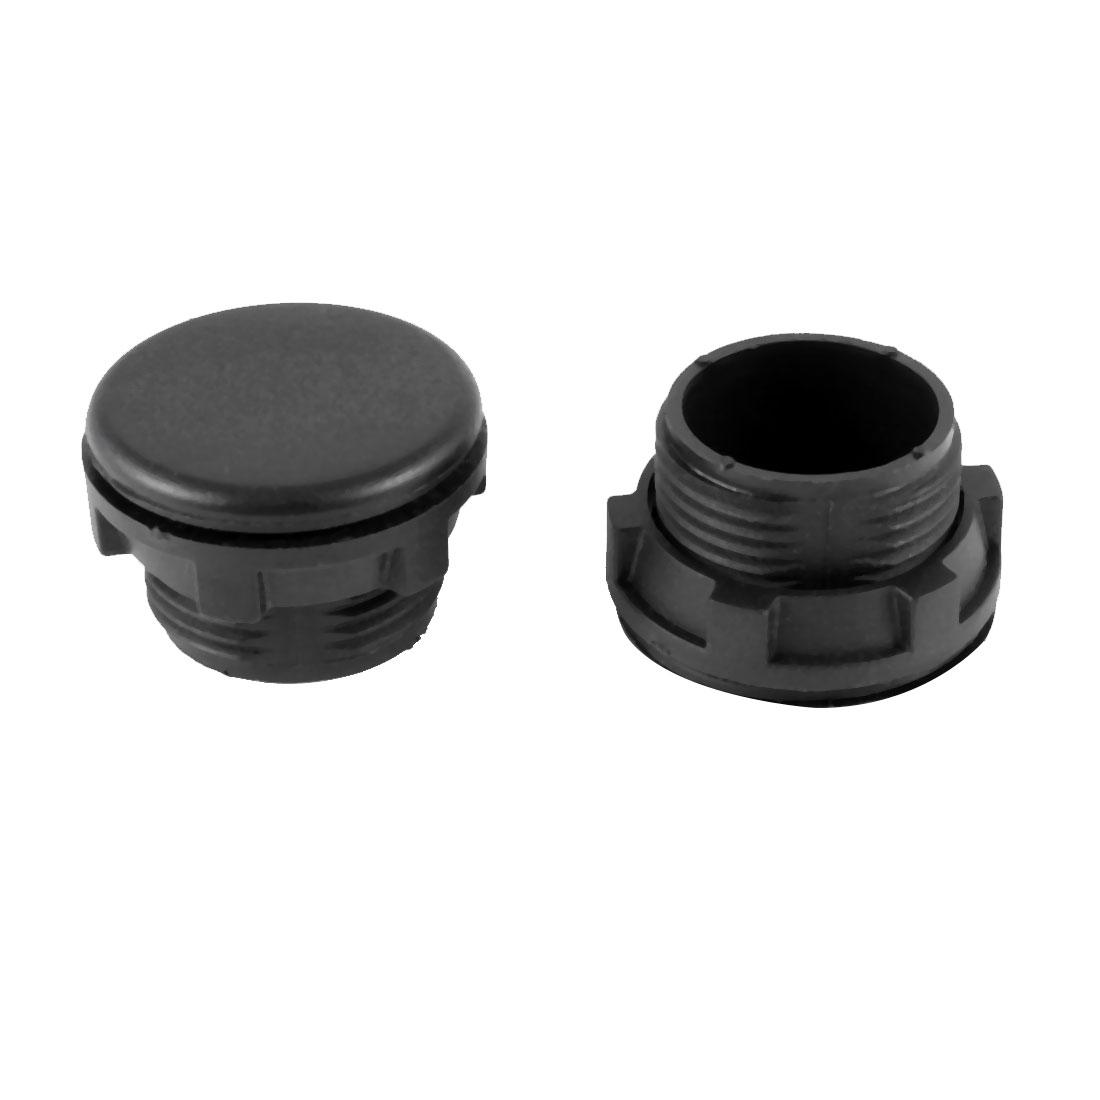 2 Pcs Furniture 22mm Diameter Black Plastic Screw Type Panel Hole Stopper